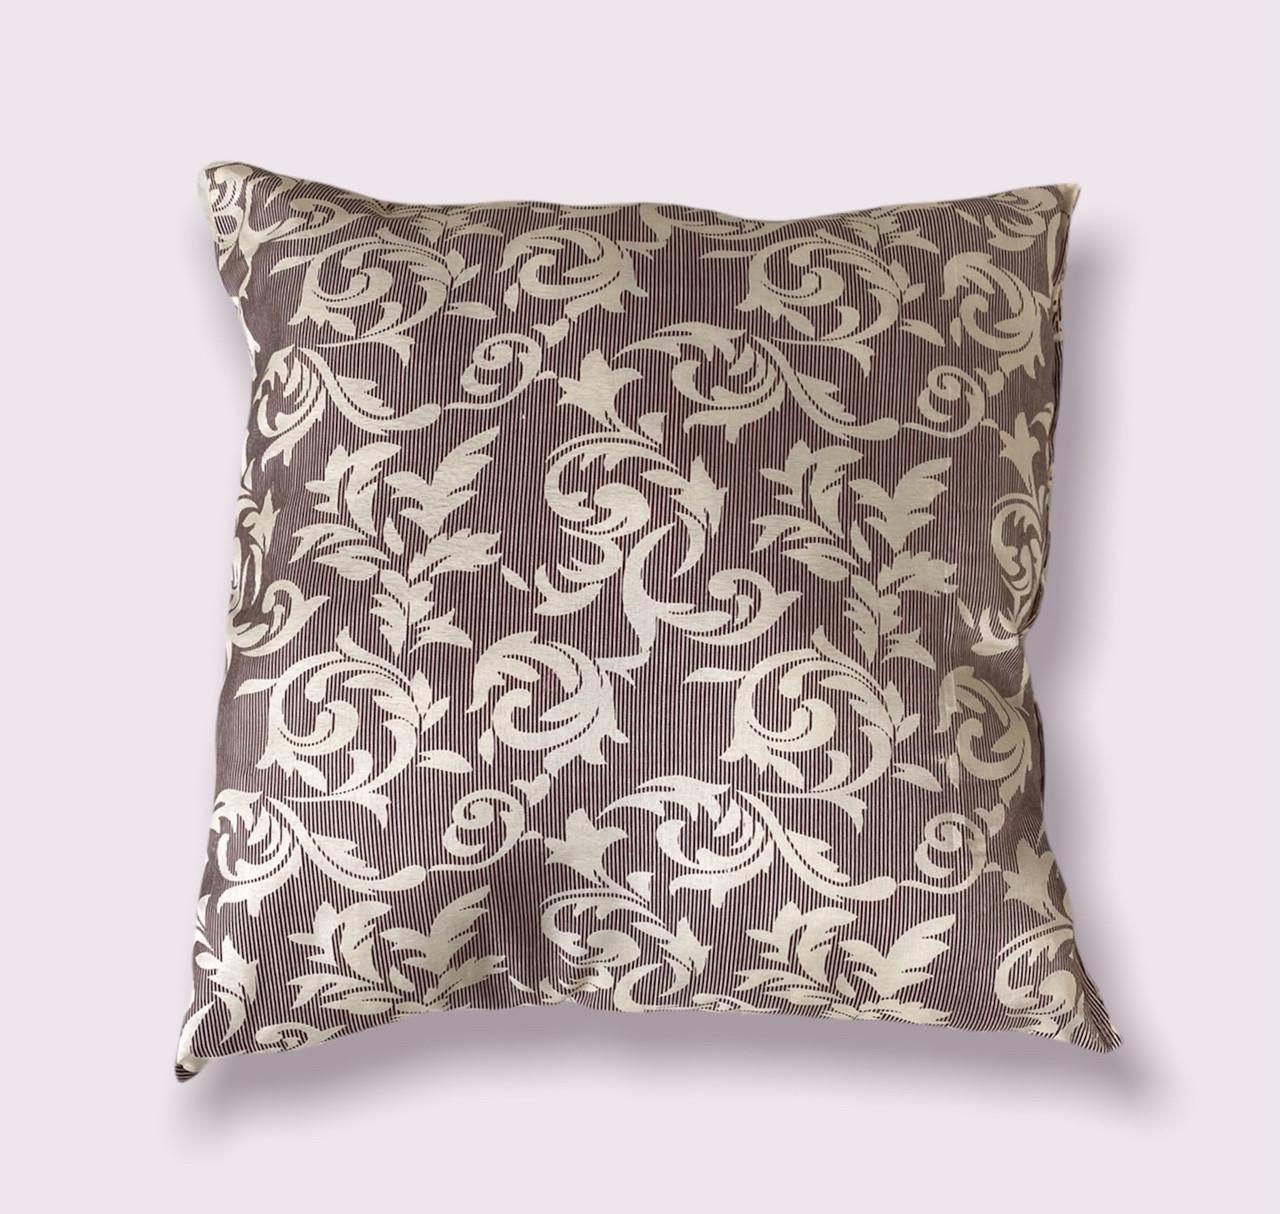 Подушка наповнювач холофайбер 50х50/Маленька подушка/ Подушка на диван/Дитяча подушка